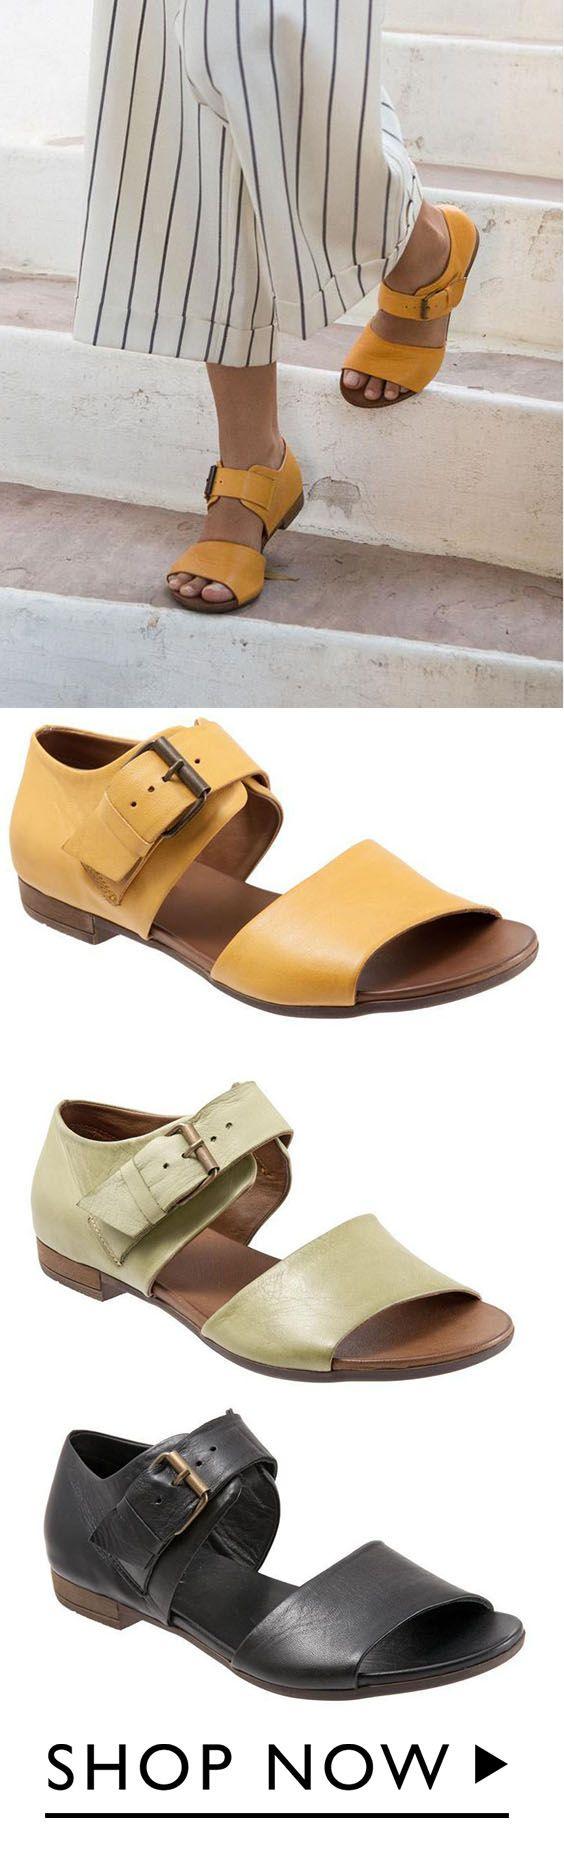 Size Leisure Flat Sandals